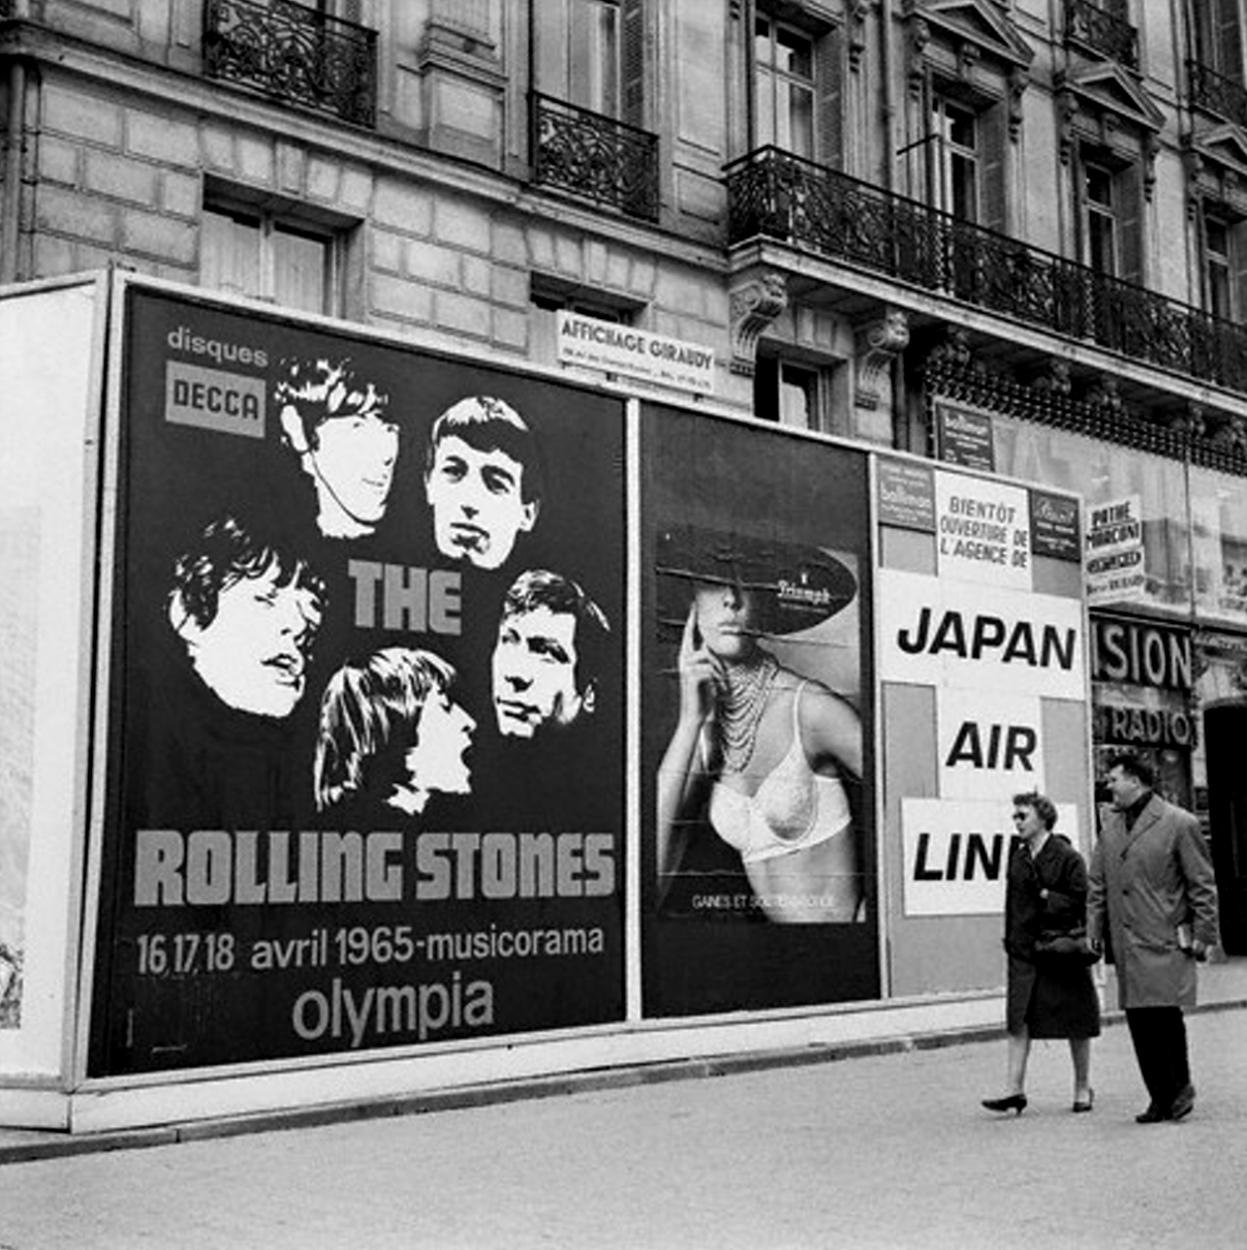 rolling stones billboard